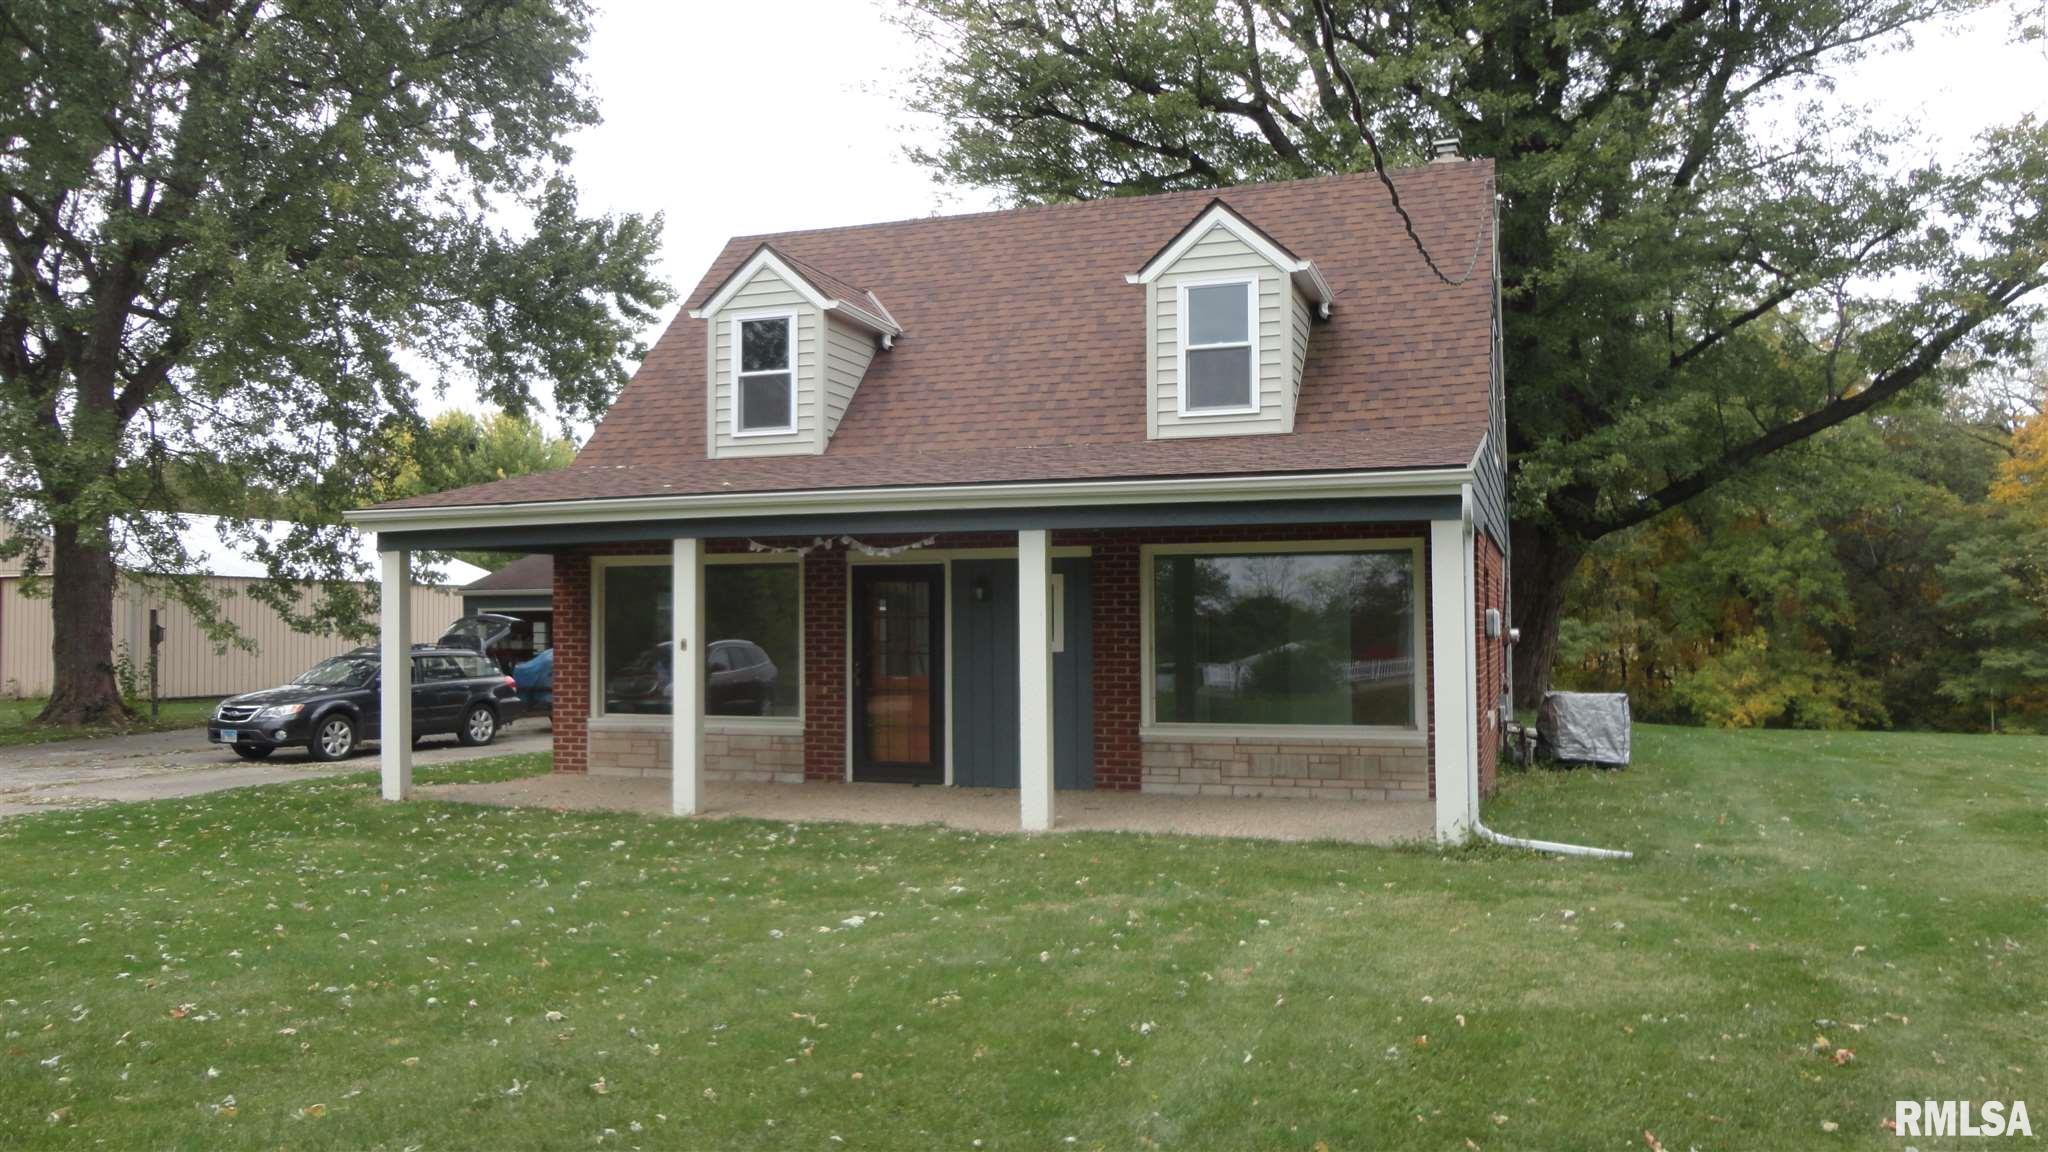 2925 S HILTON Property Photo - Peoria, IL real estate listing